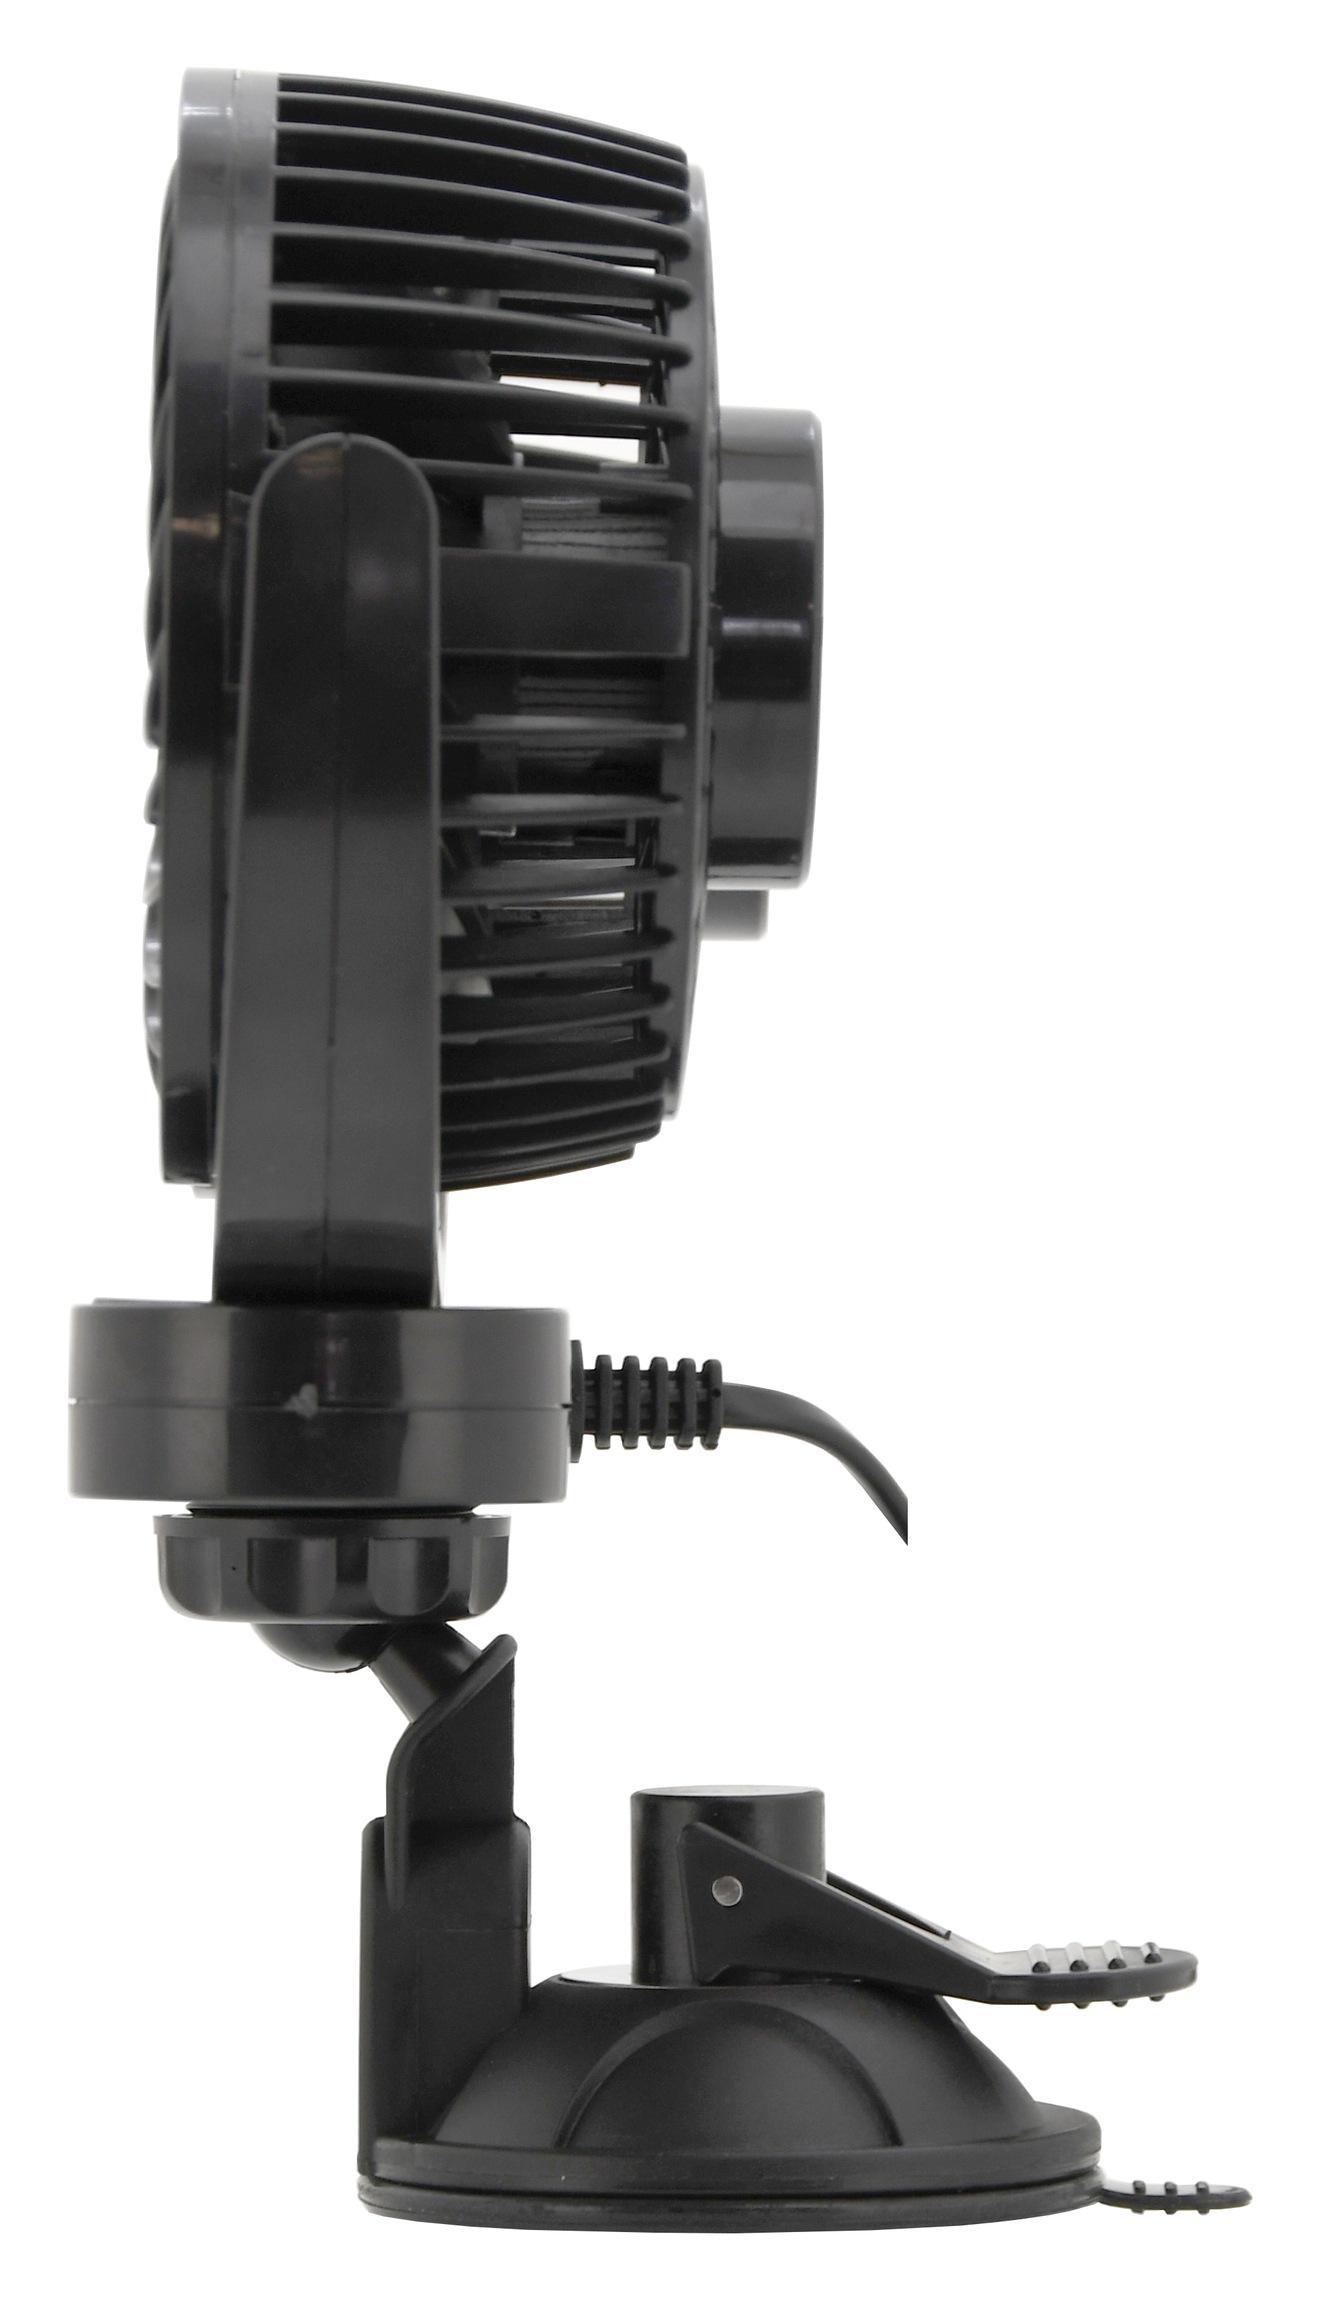 Ventilátor MITCHELL DUO 2x108mm 12V na přísavku